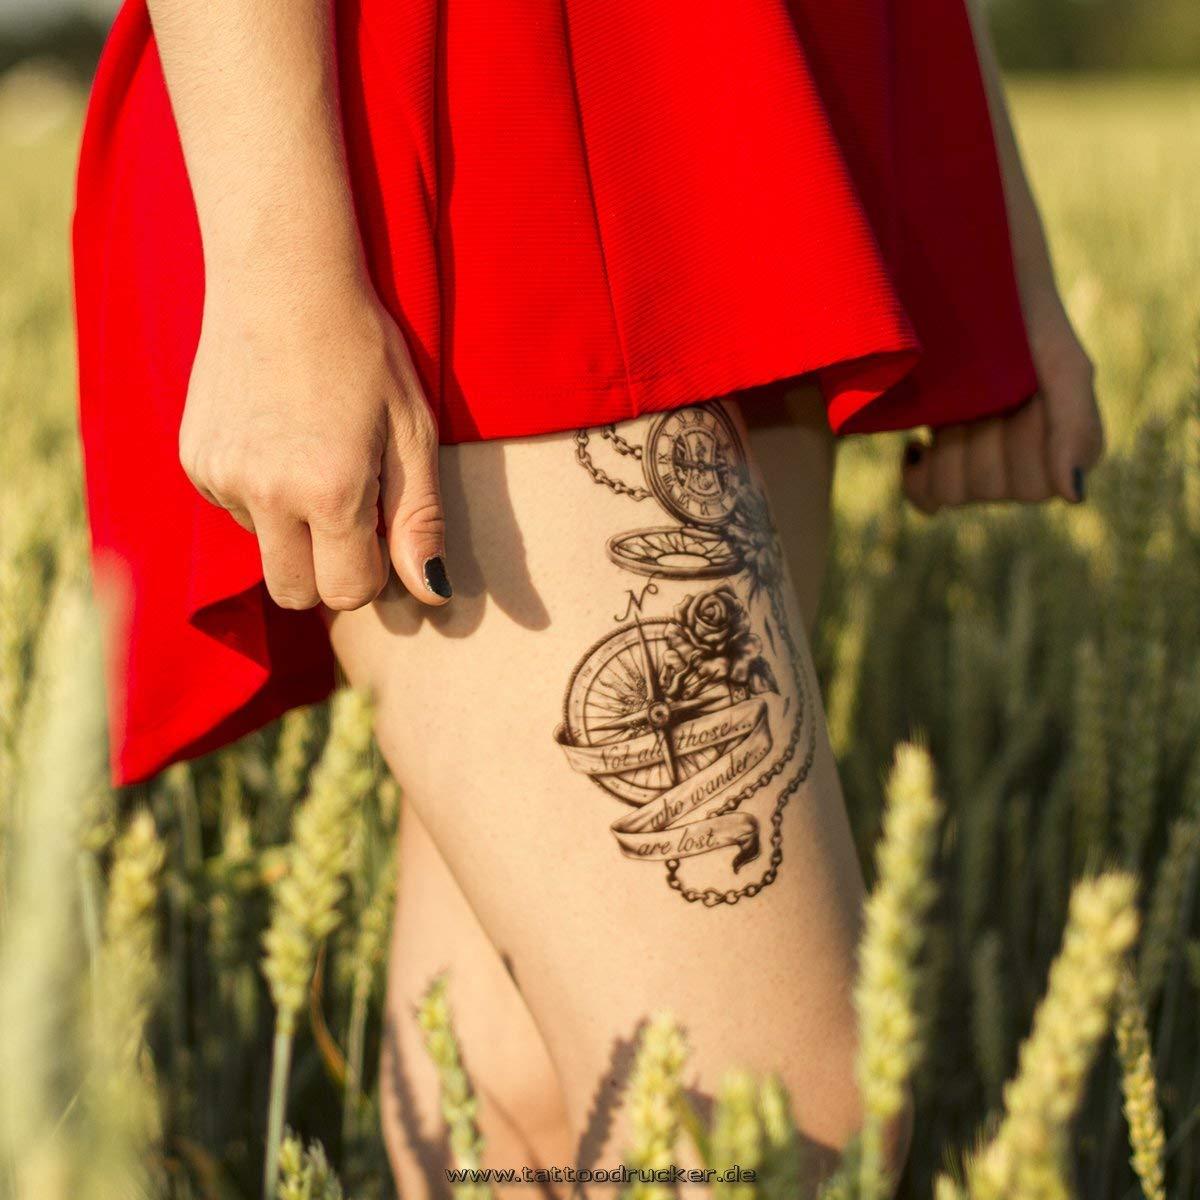 Brújula Reloj XL Tattoo en negro - Fake temporäres una vez Cuerpo adhesivo hb881, negro, 1 x Kompass-Uhr HB-881 Tattoo: Amazon.es: Hogar